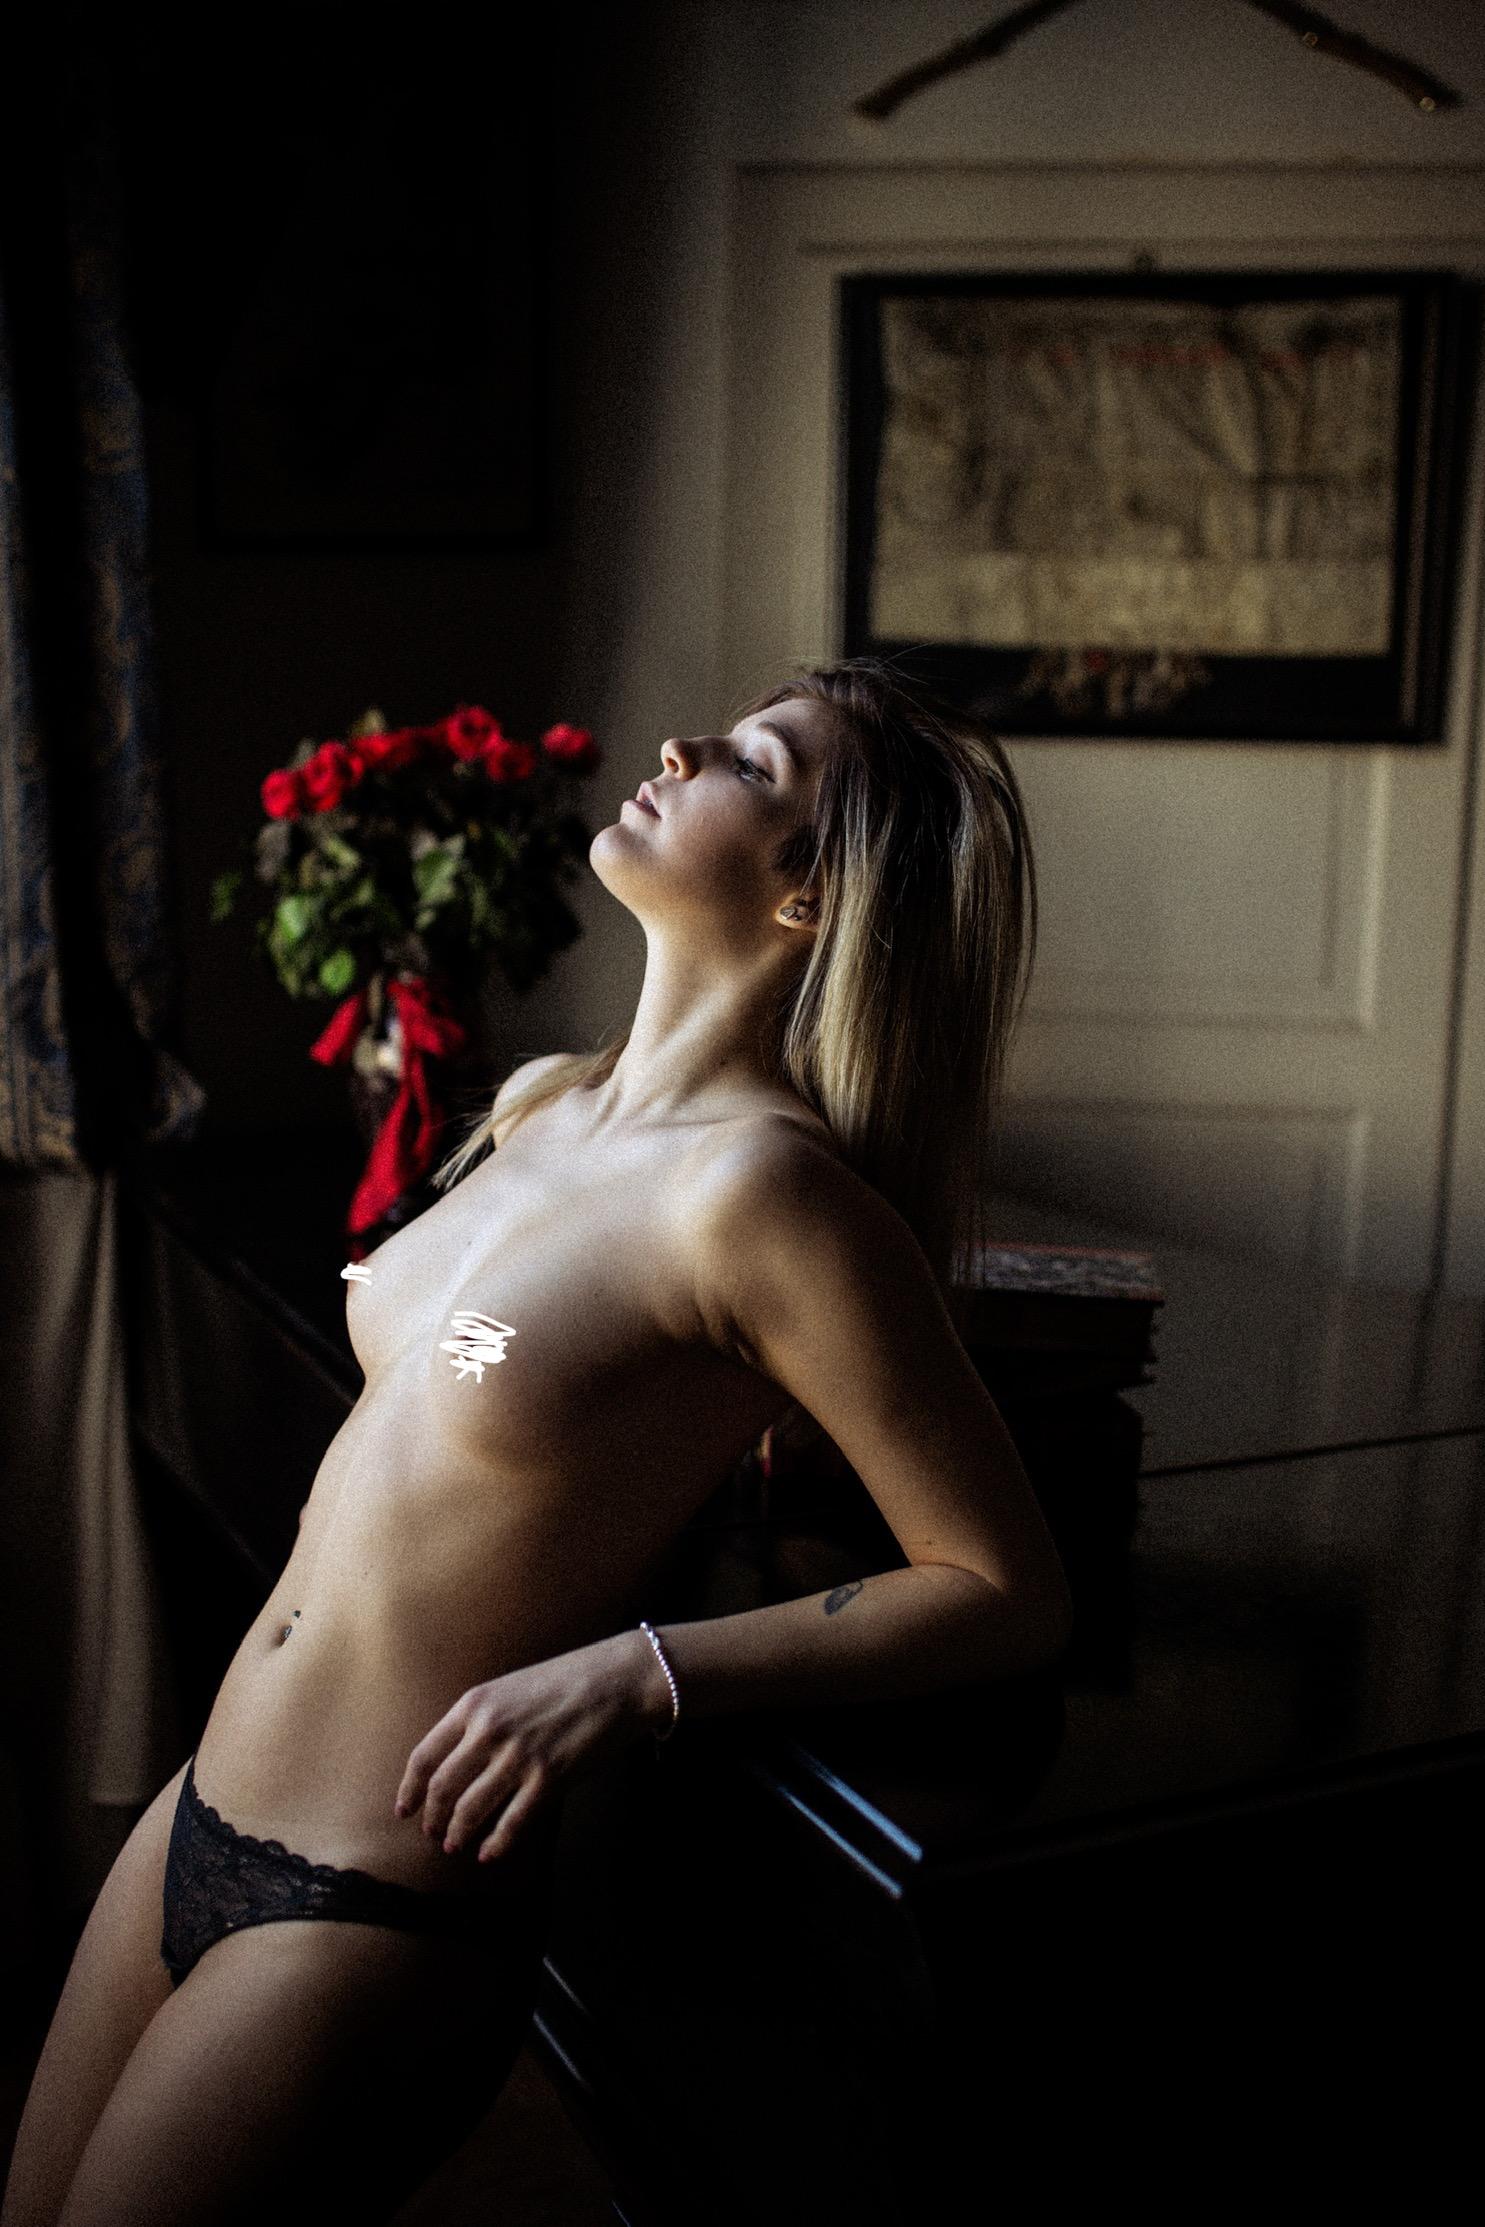 Categorie: Boudoir & Artistic Nude, Glamour, Fashion, Portrait - Model: GAIA TORRESIN- Ph. vari - Location: Parma e altre